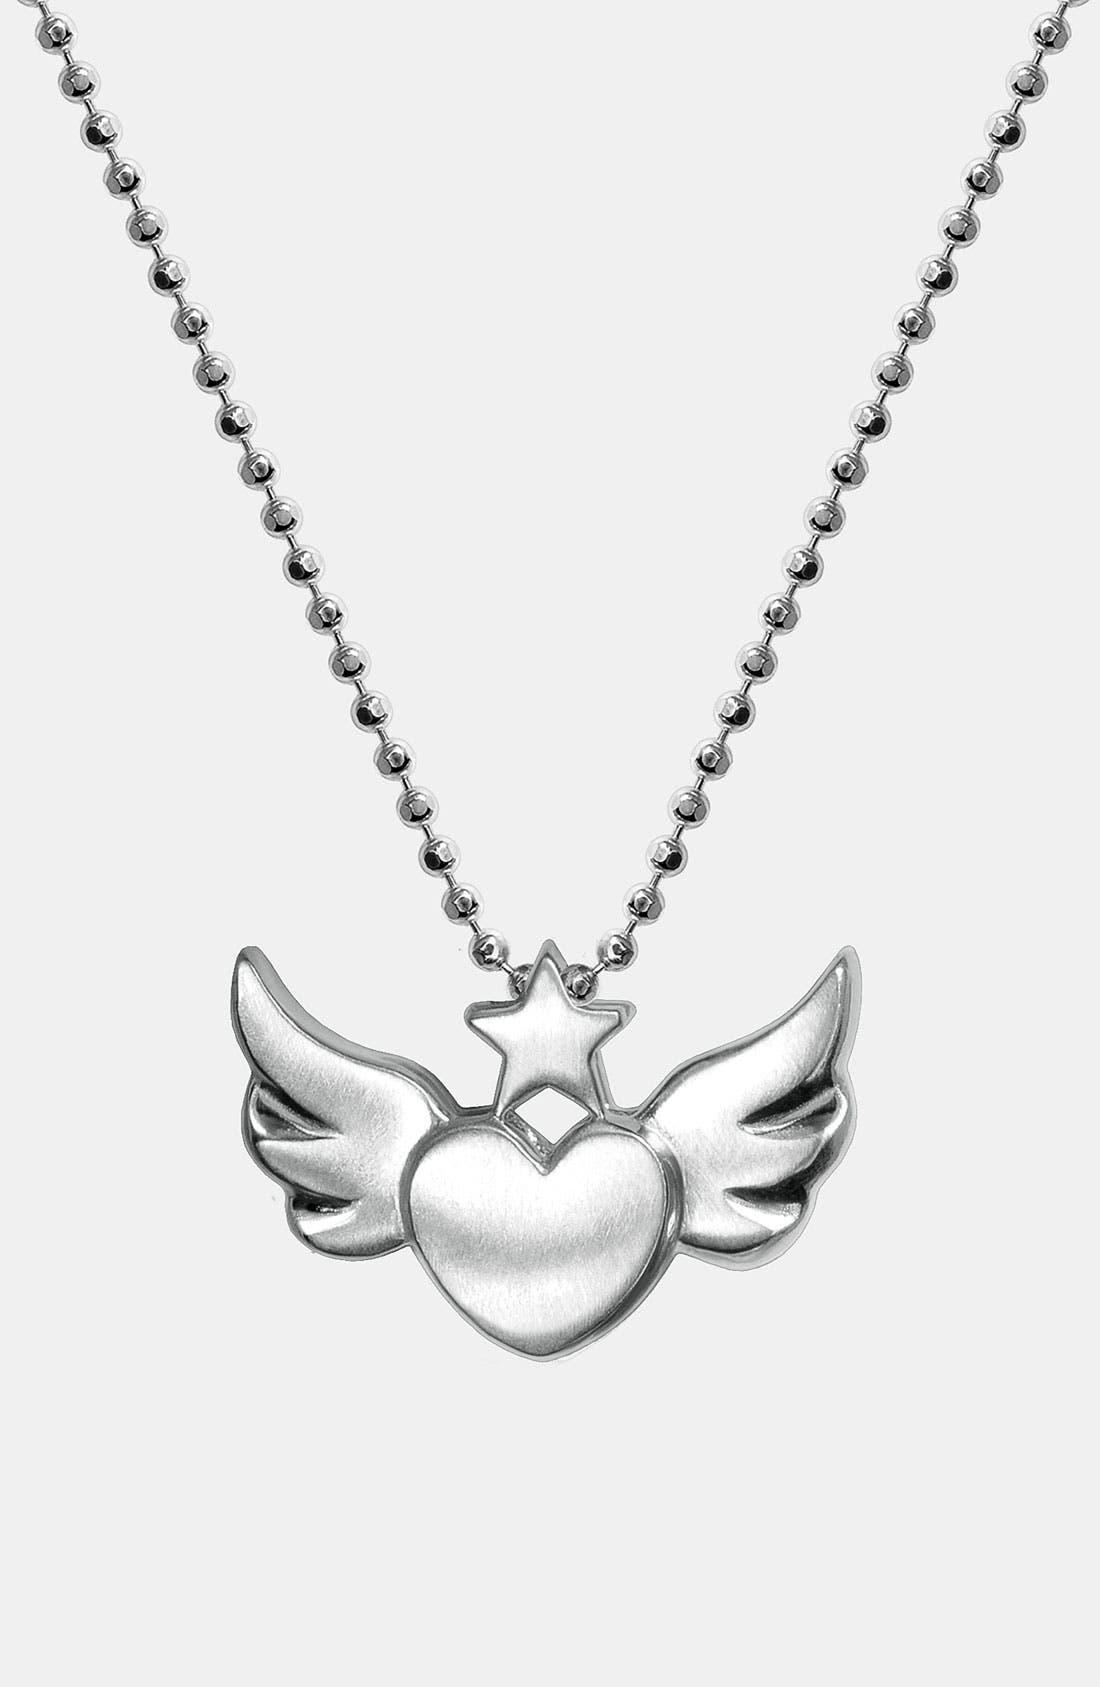 Alternate Image 1 Selected - Alex Woo 'Little Rock Star' Heart & Wings Pendant Necklace